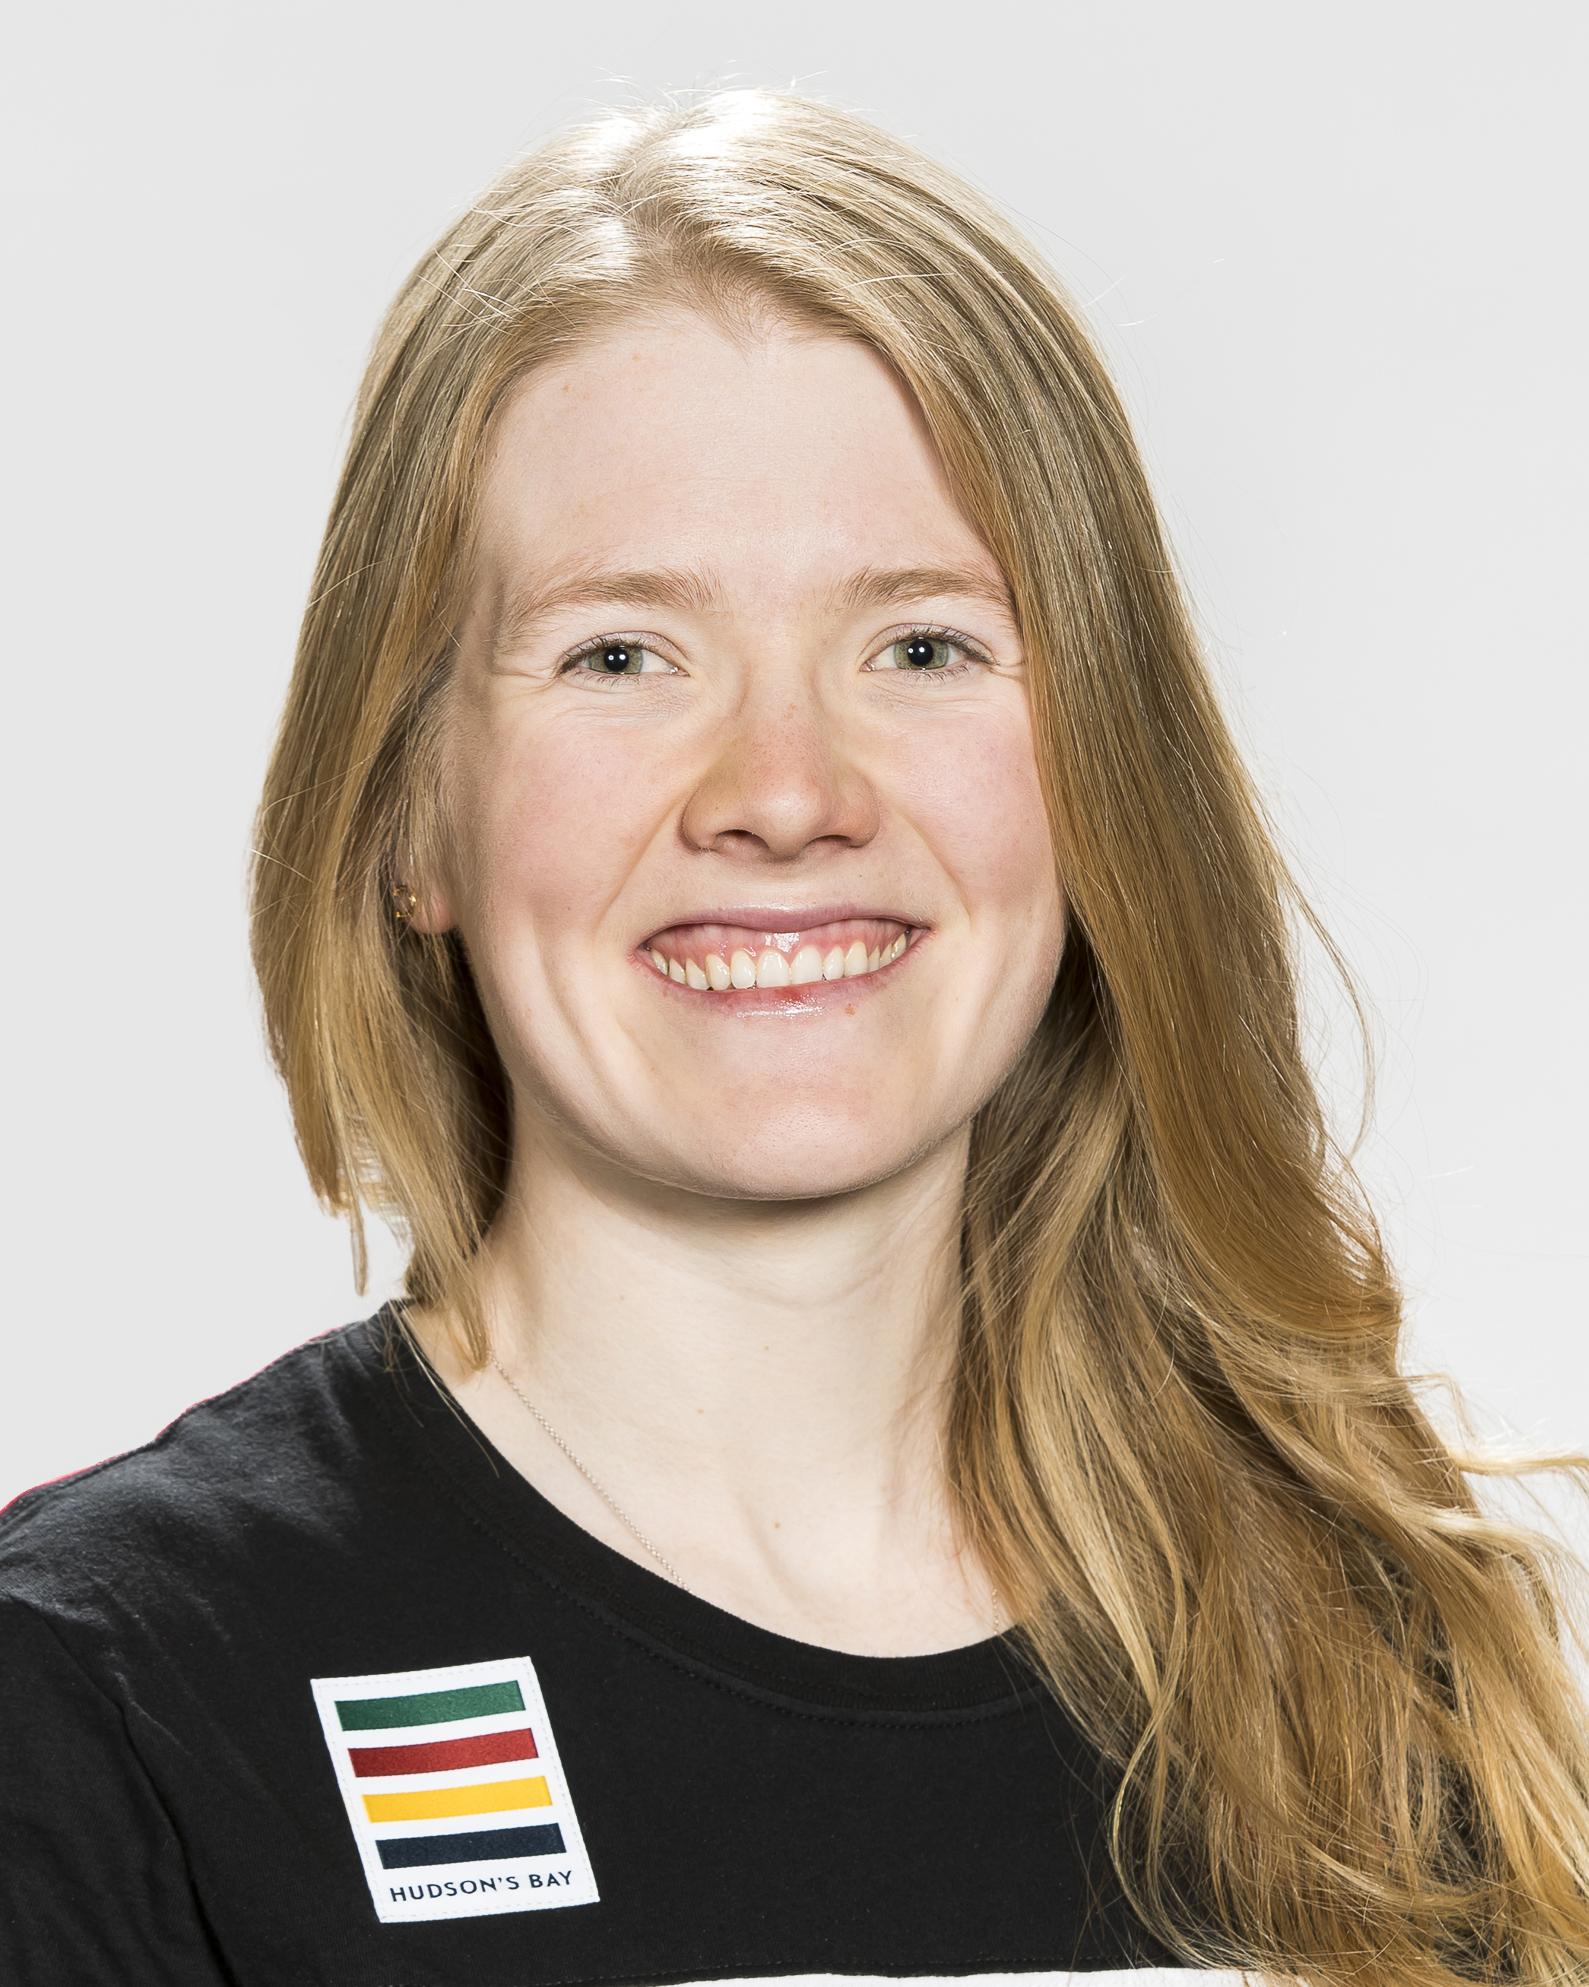 Emma Lunder